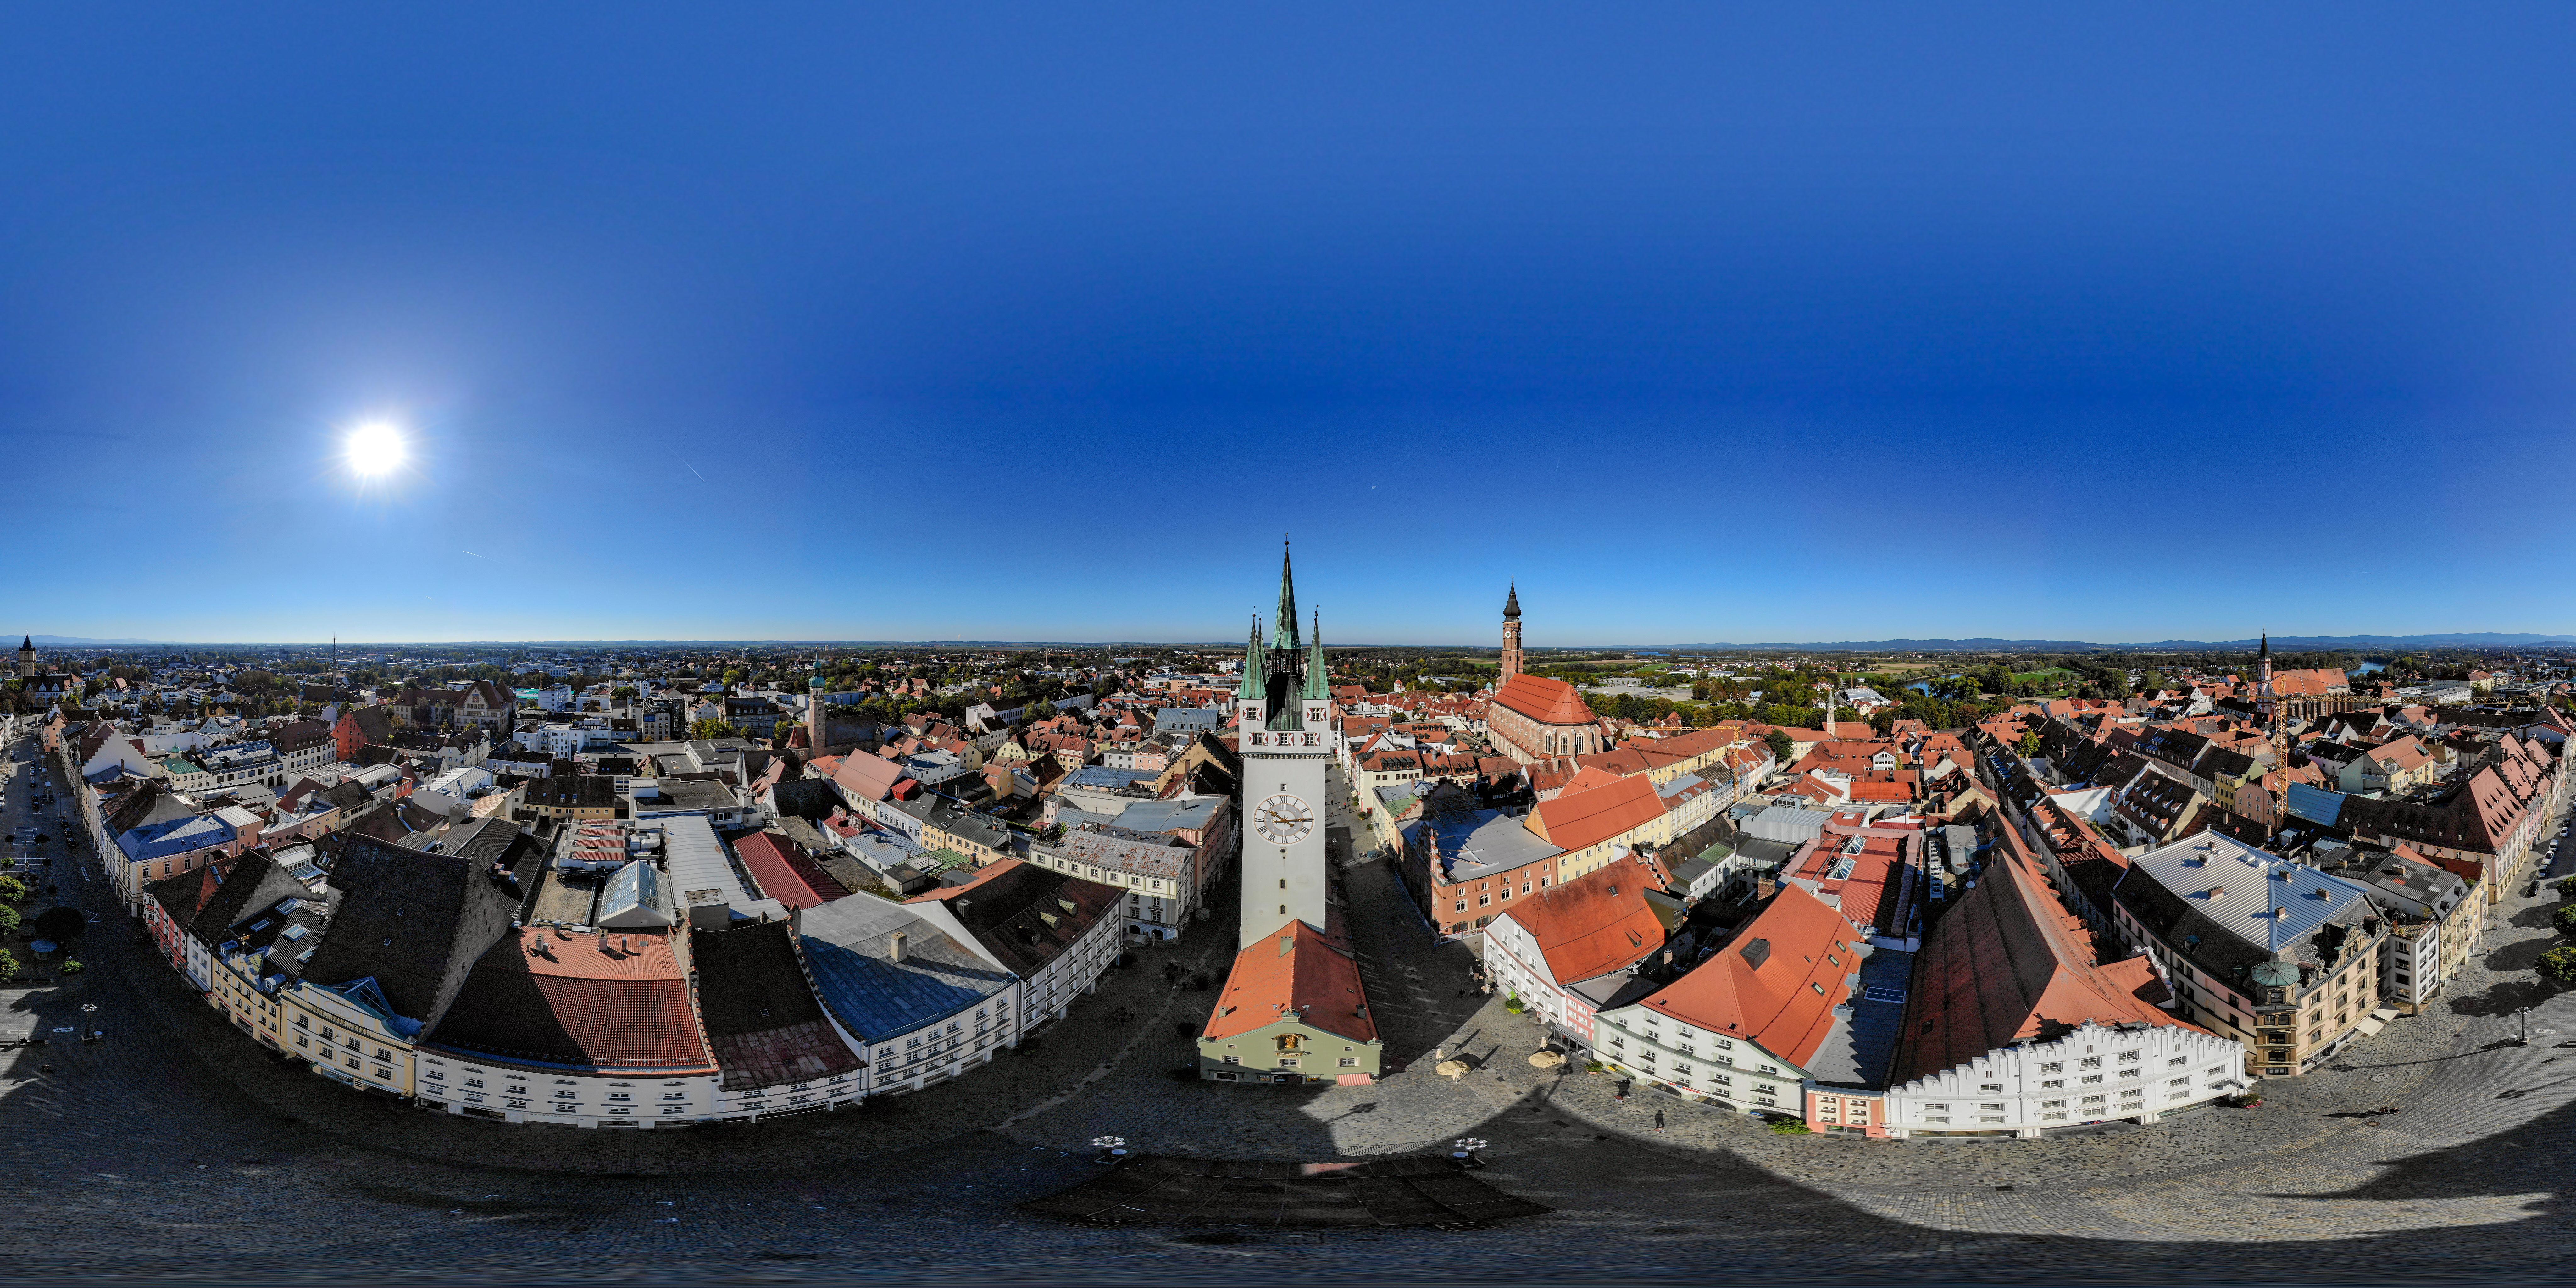 180930_Straubing_Neustadt_50206